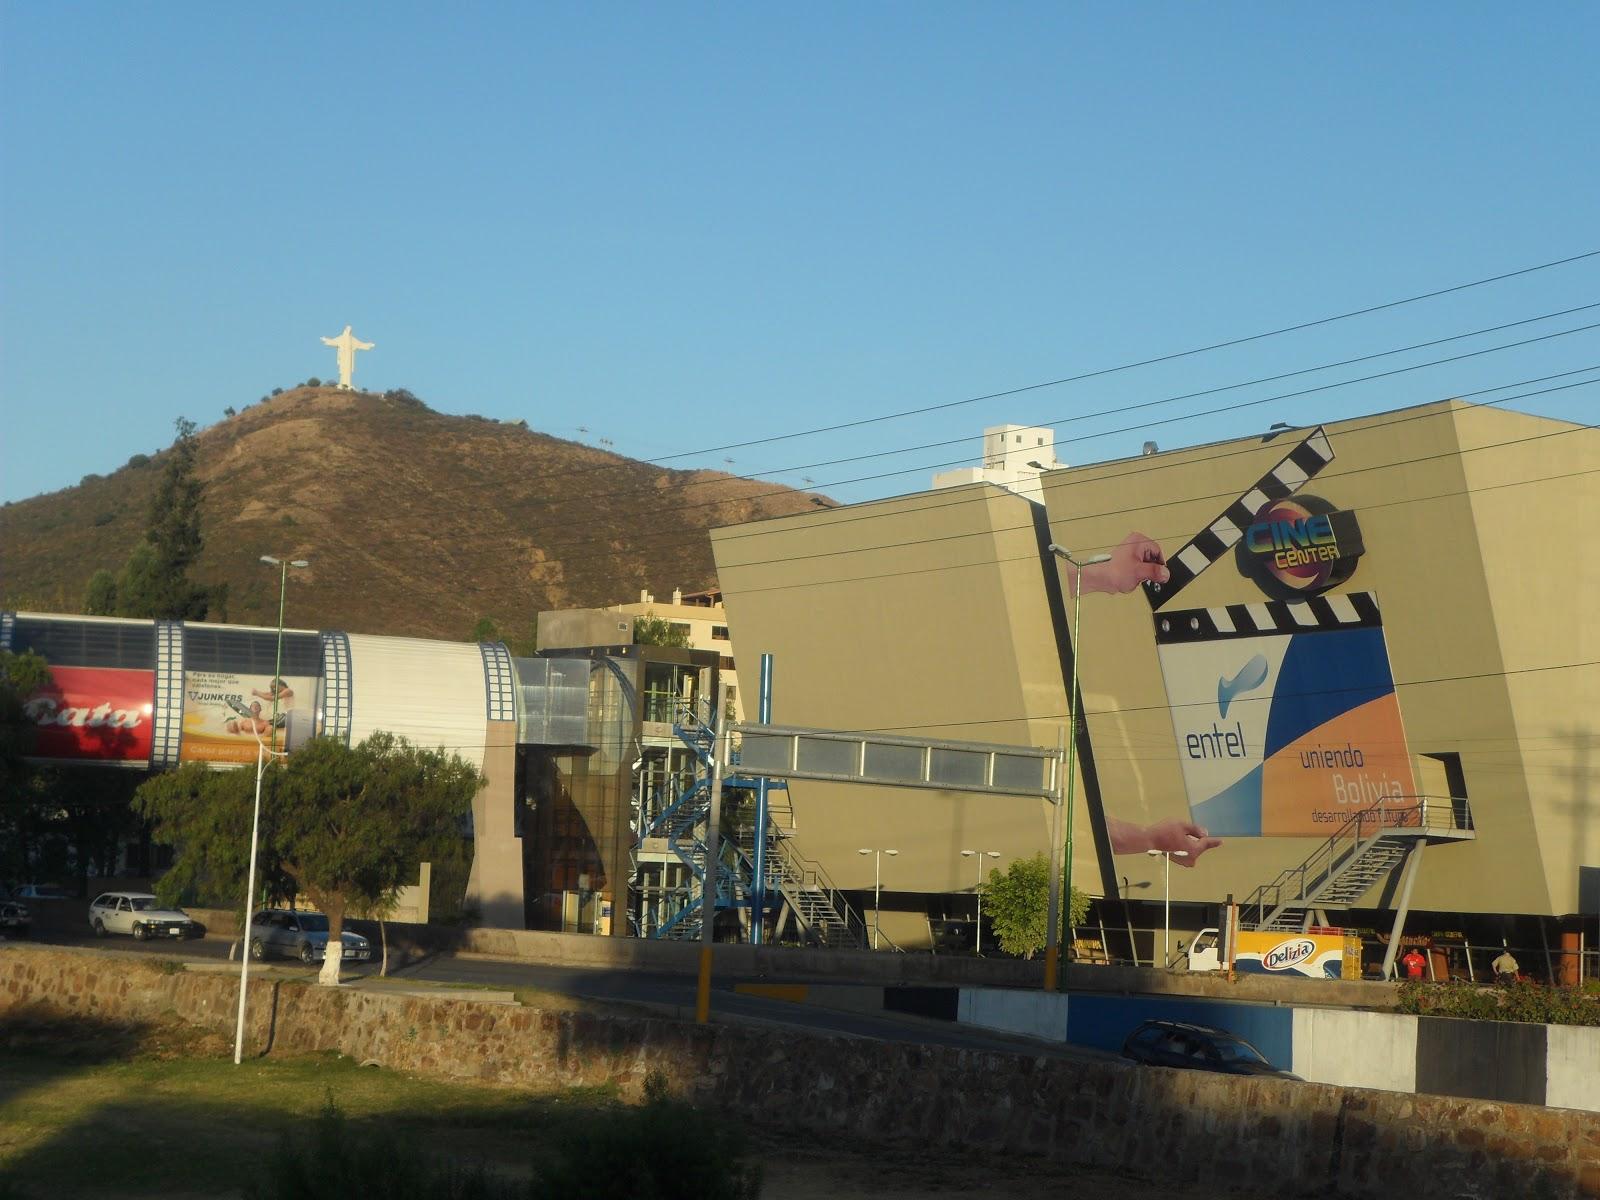 Cine Center